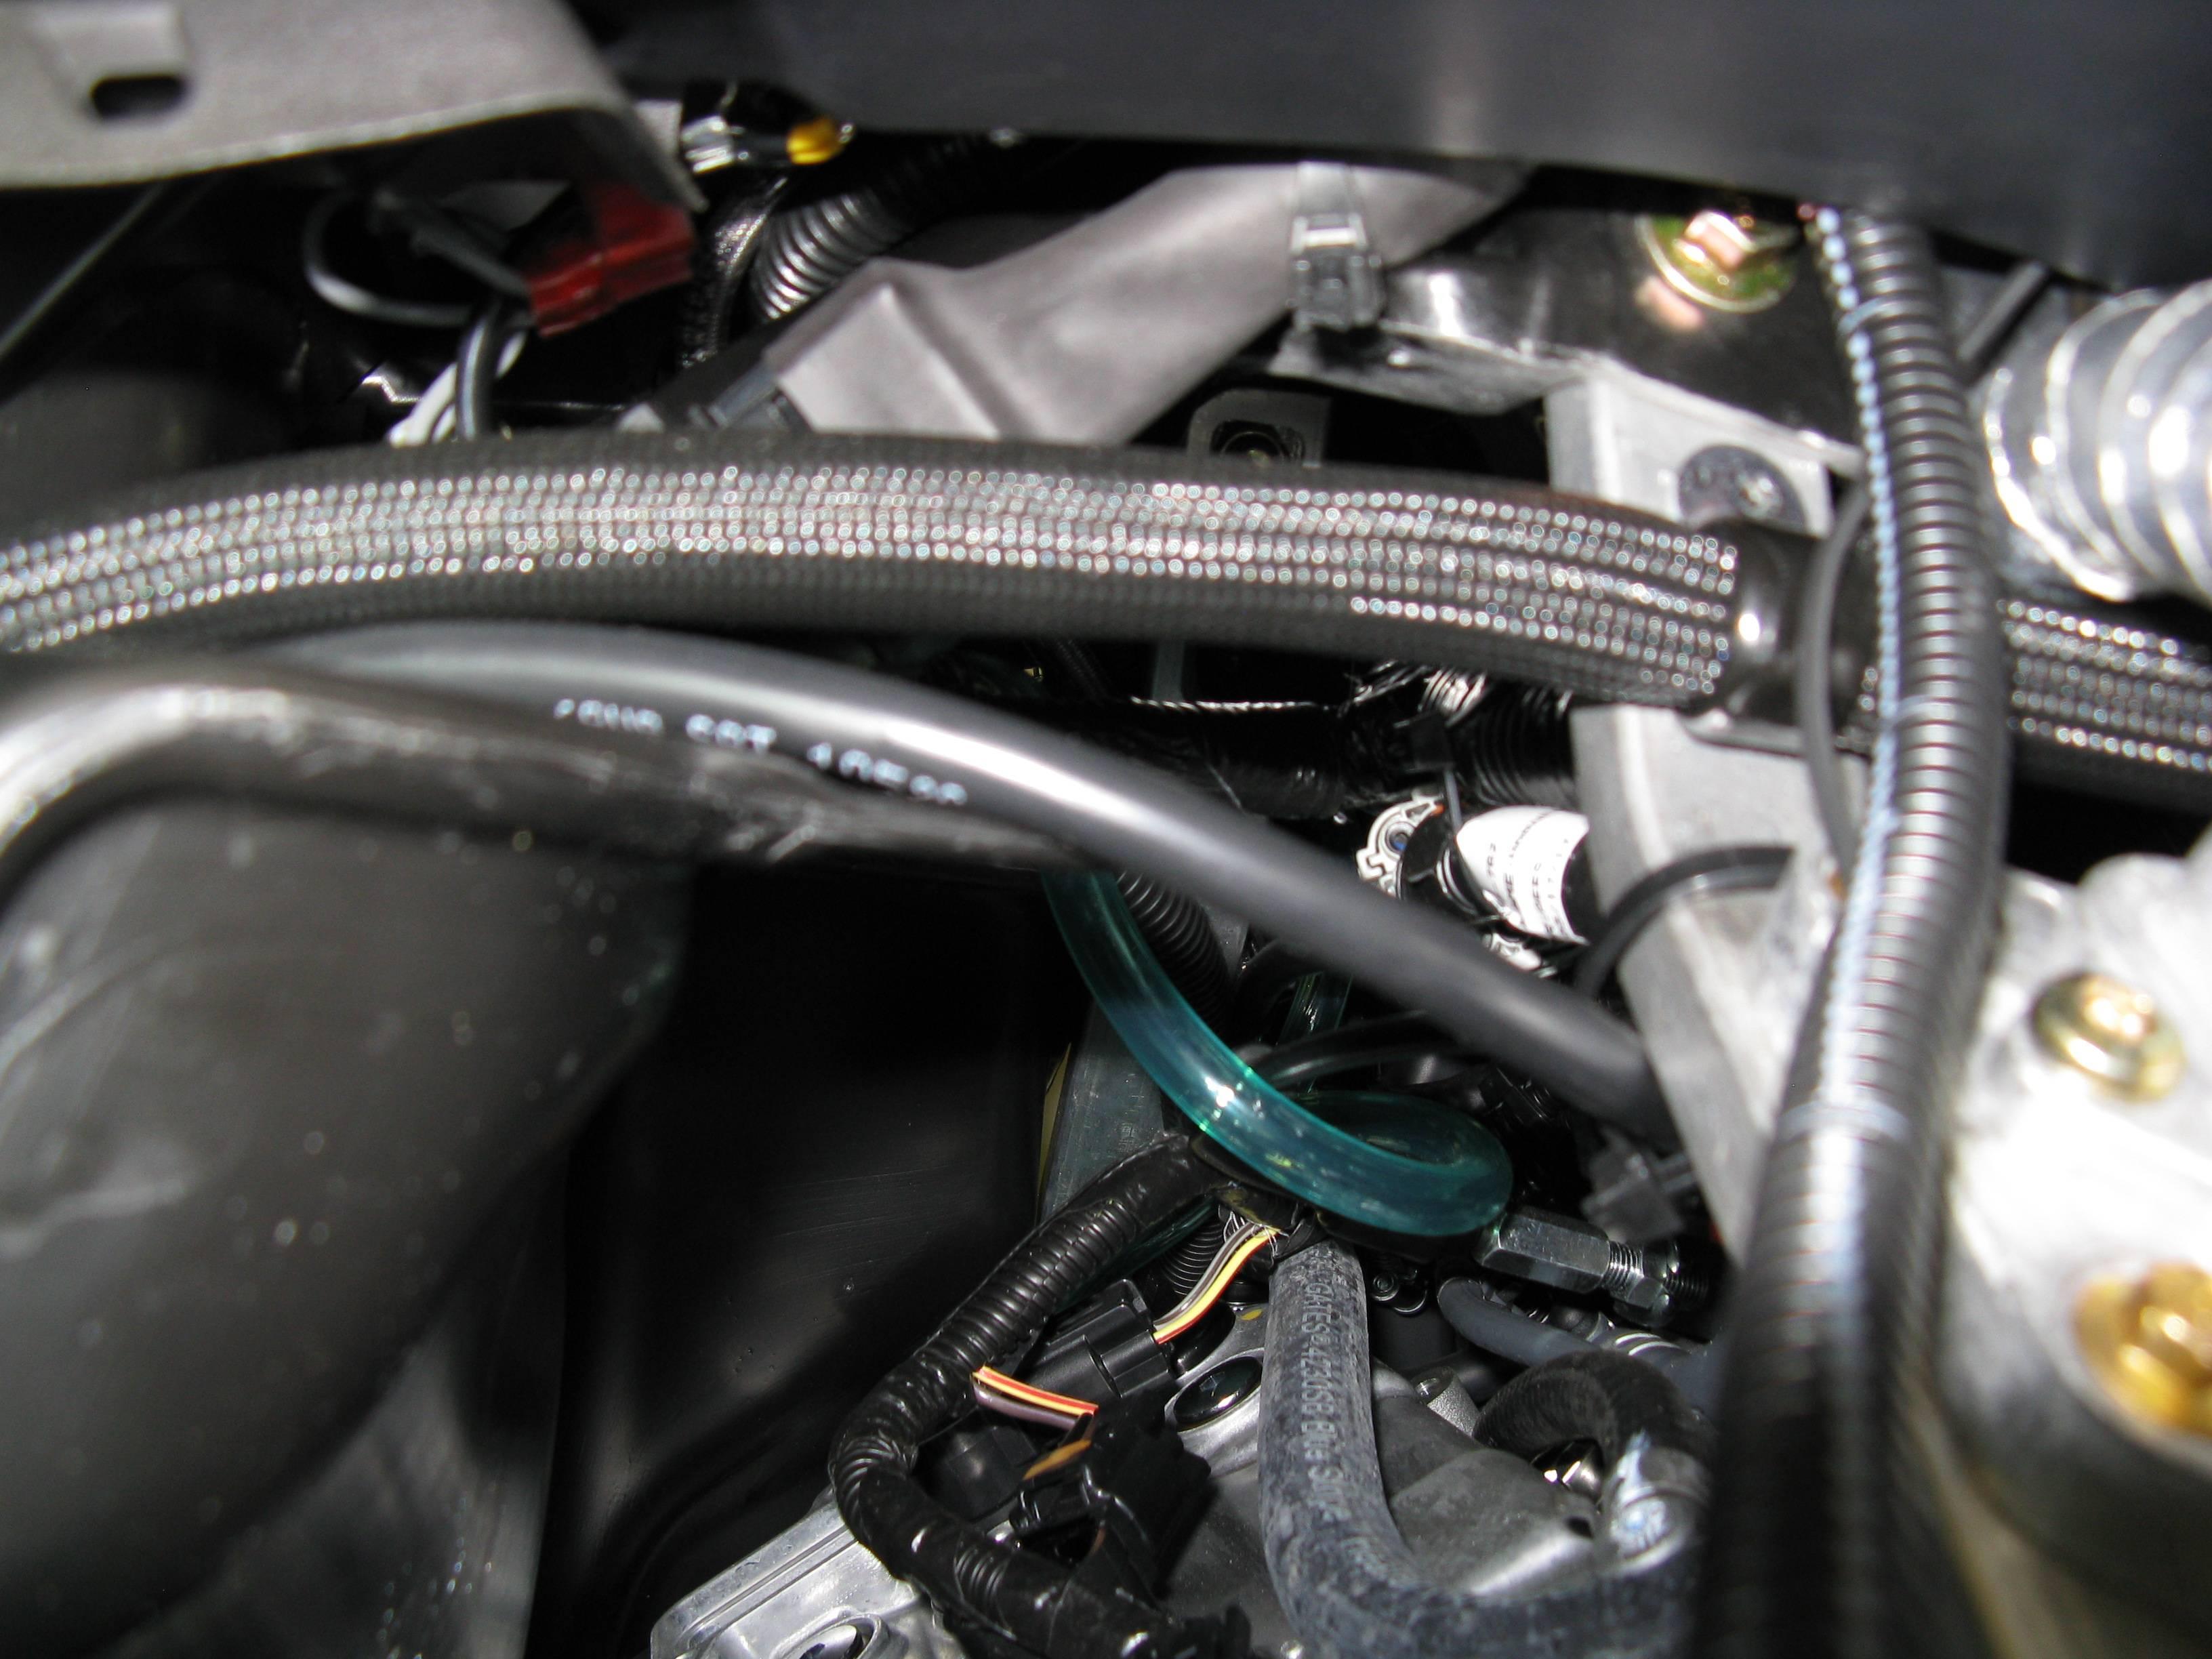 Main ROV harness/relay installed